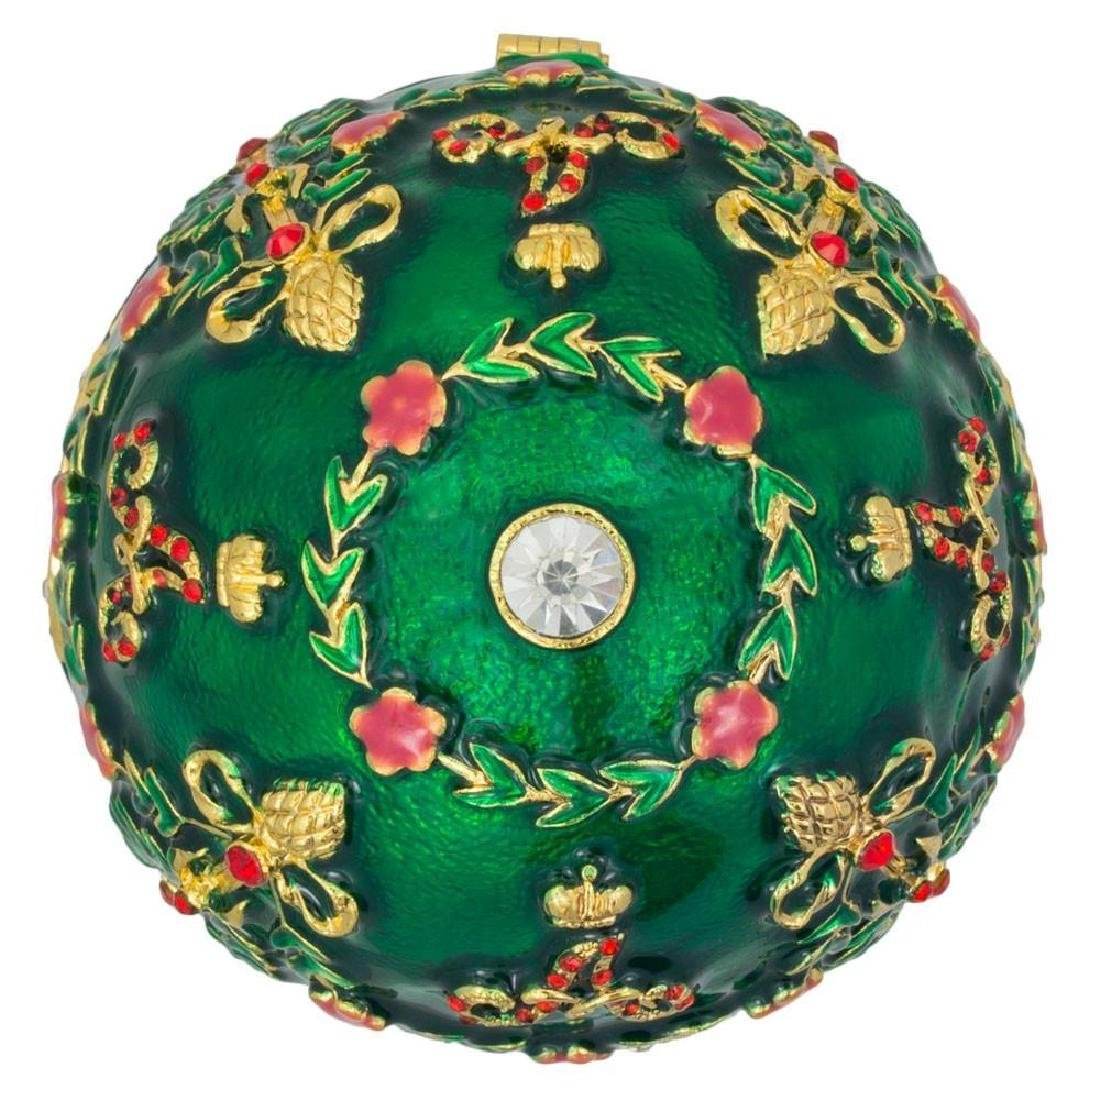 Faberge Inspired 1908 Alexander Palace Faberge Egg - 6